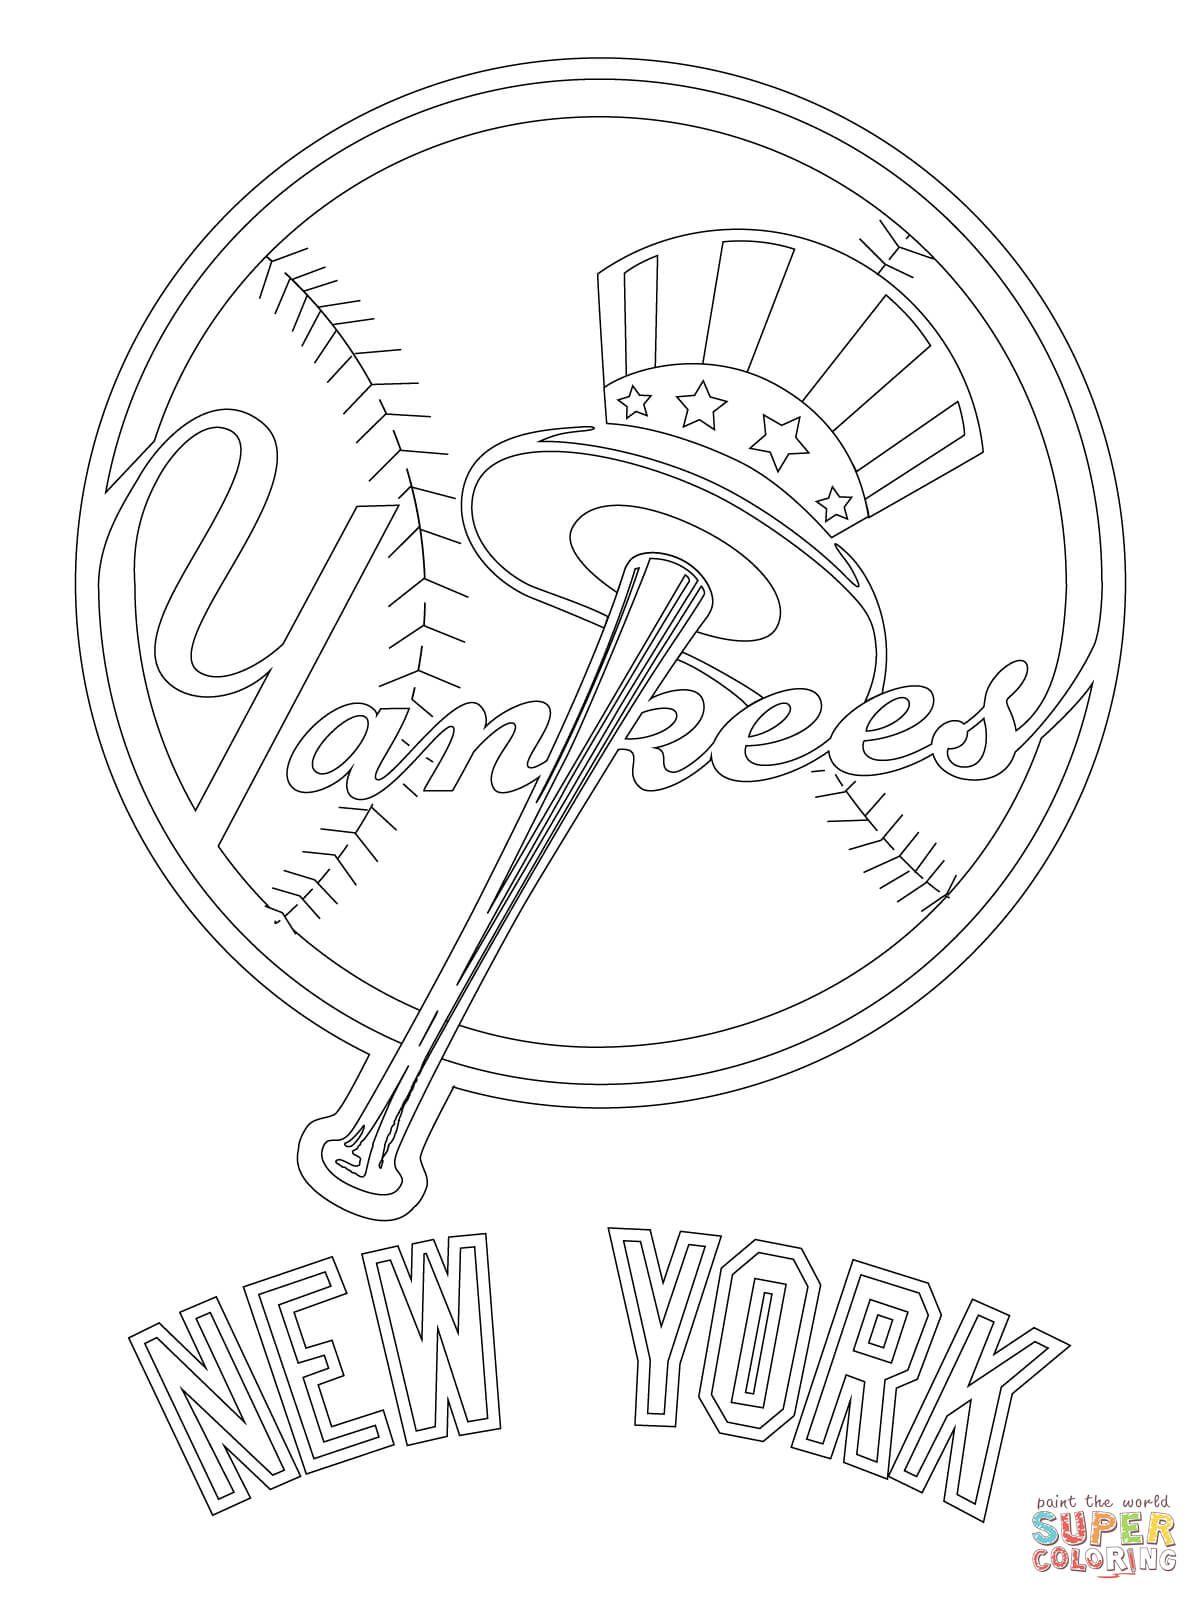 New York Yankees Logo Coloring Page Jpg 1 200 1 600 Pixels New York Yankees Logo Baseball Coloring Pages Yankees Logo